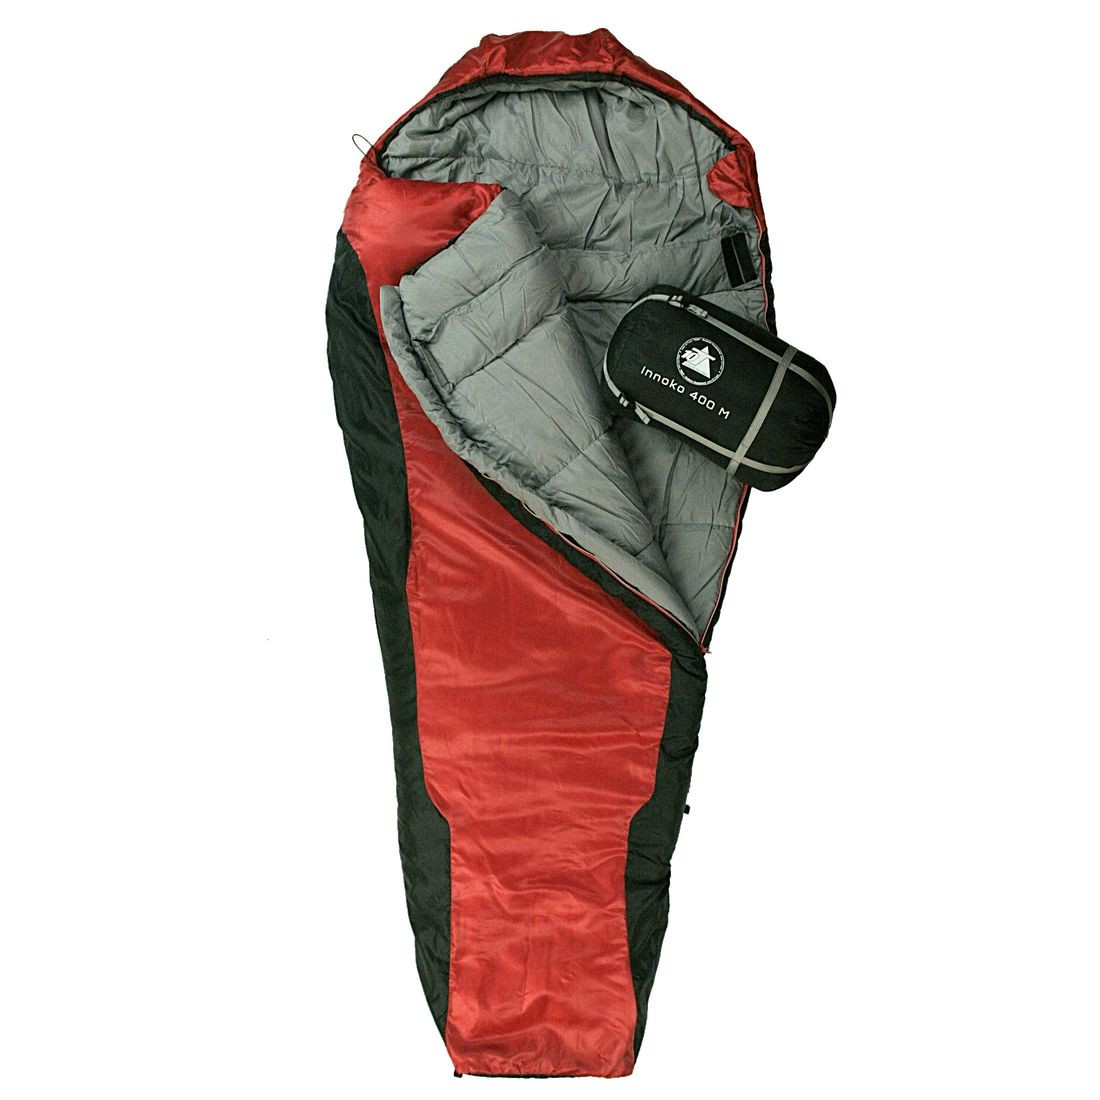 10t Innoko 400m Single Mummy Sleeping Bag 200x85 55 Cm